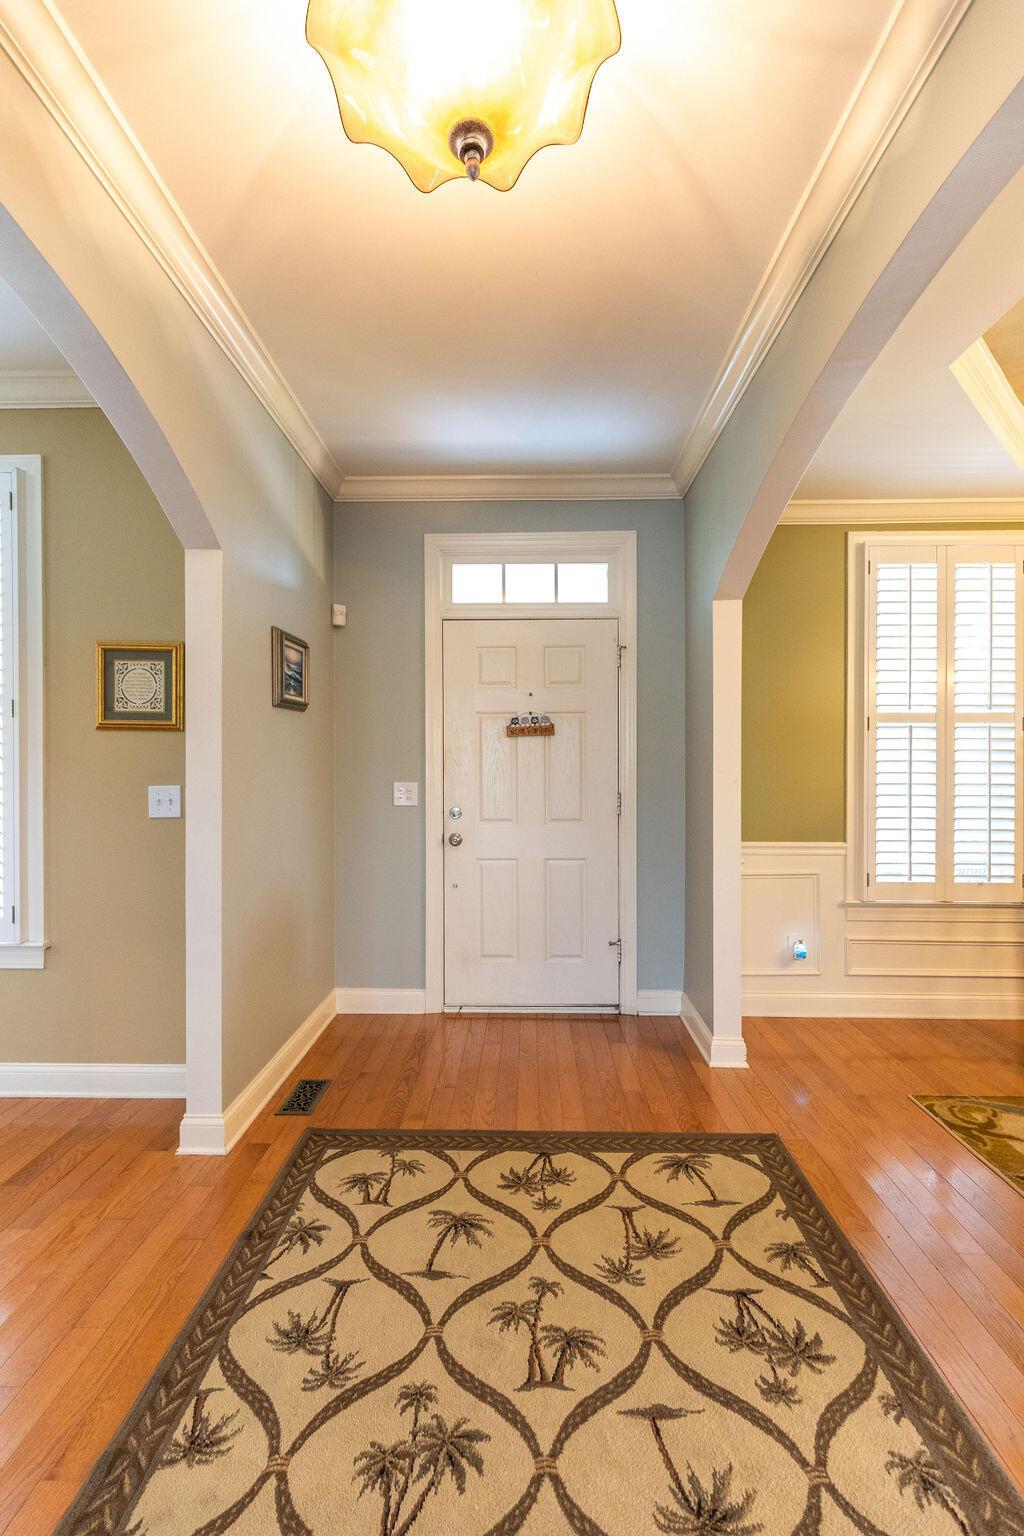 Dunes West Homes For Sale - 1220 Darts Cove, Mount Pleasant, SC - 26